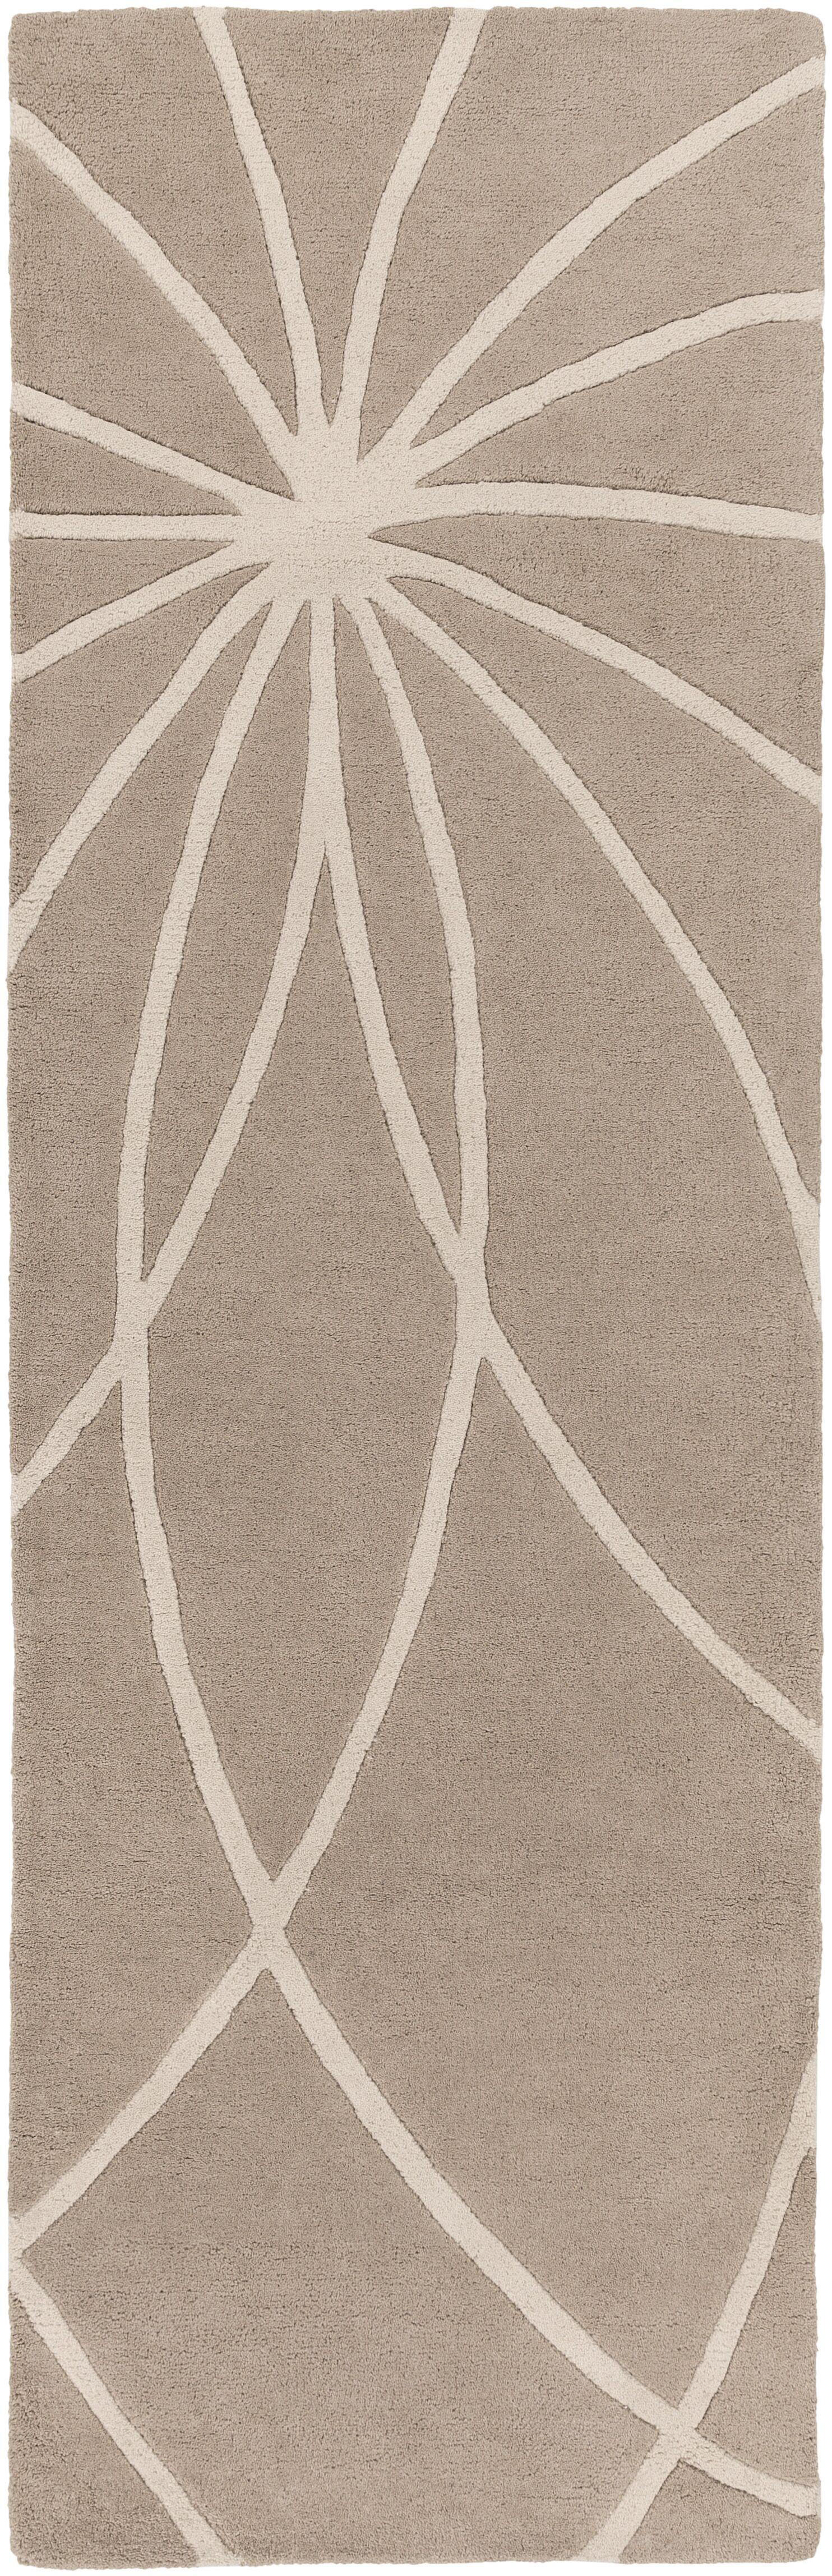 Carnahan Hand-Tufted Wool Khaki/Cream Area Rug Rug Size: Runner 3' x 12'